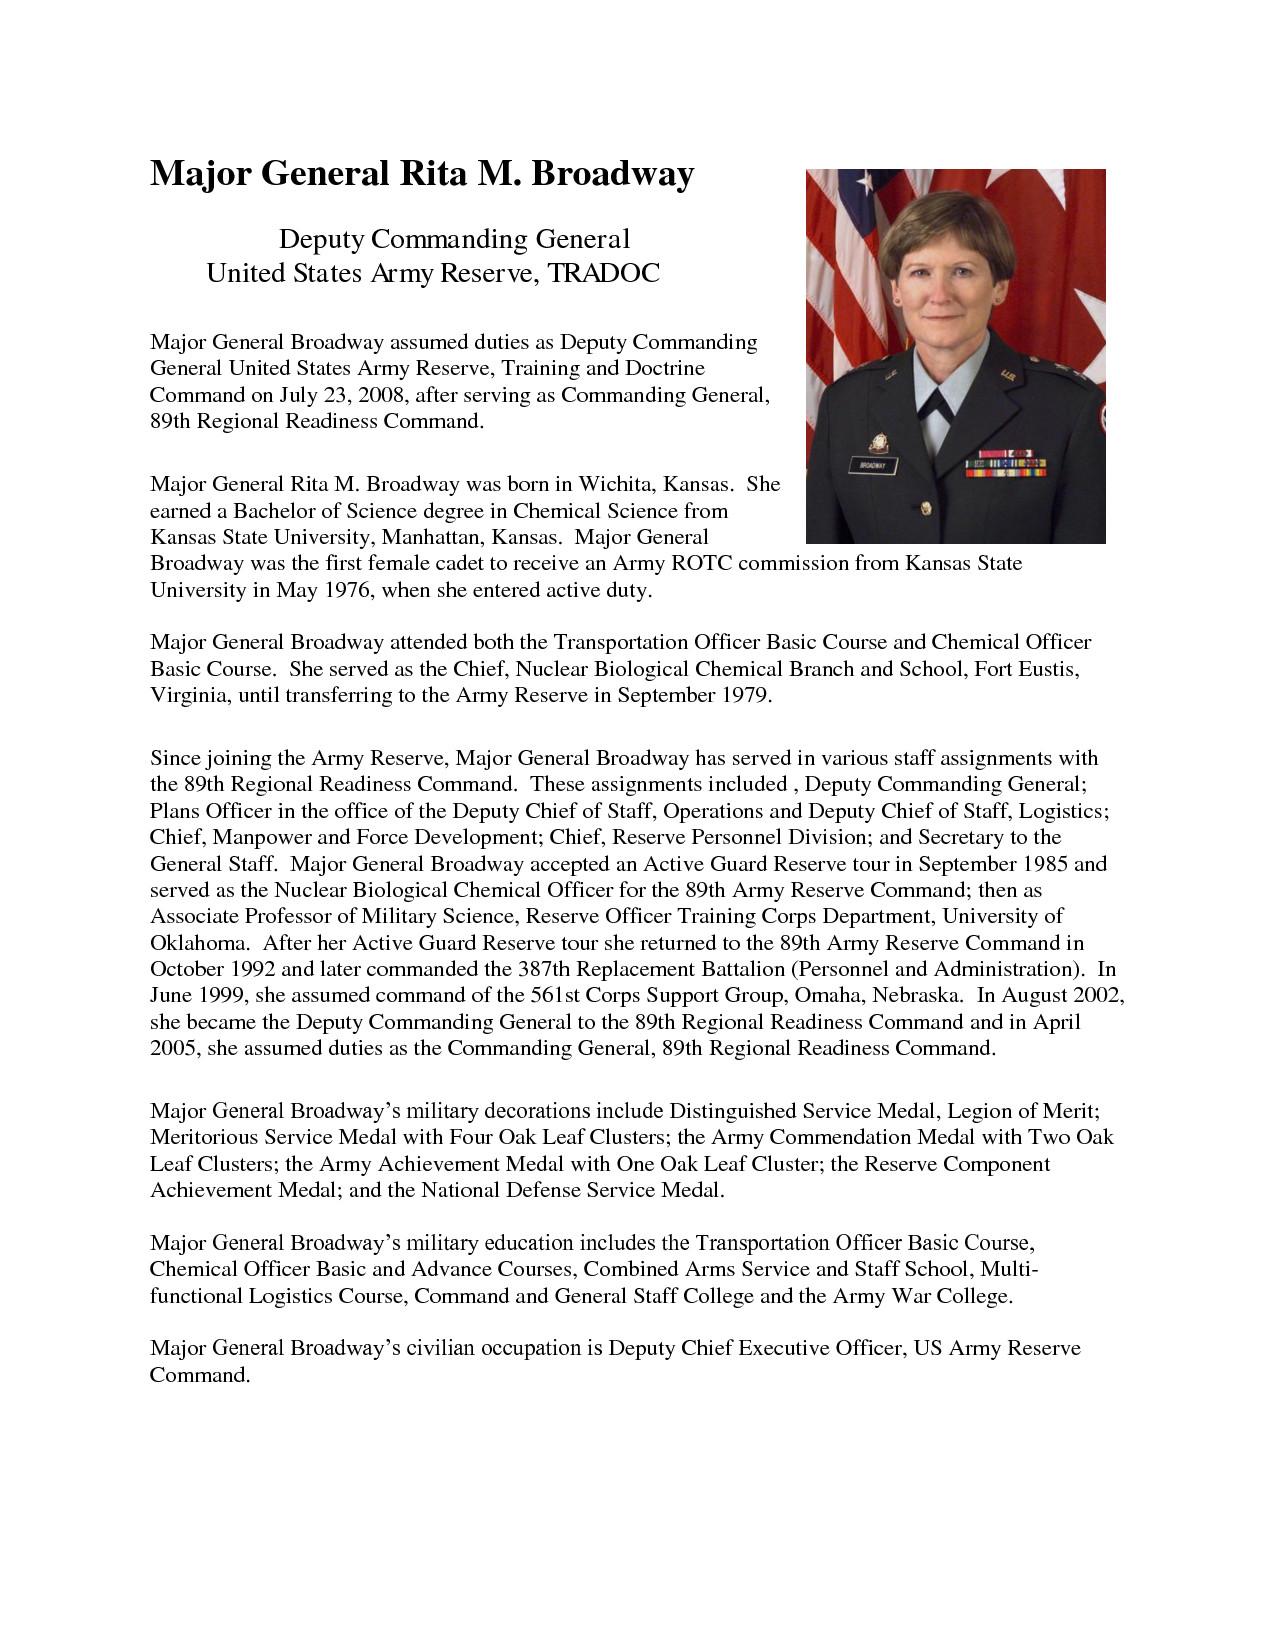 Army Board Bio Example Army Promotion Board Bio Example Free Download